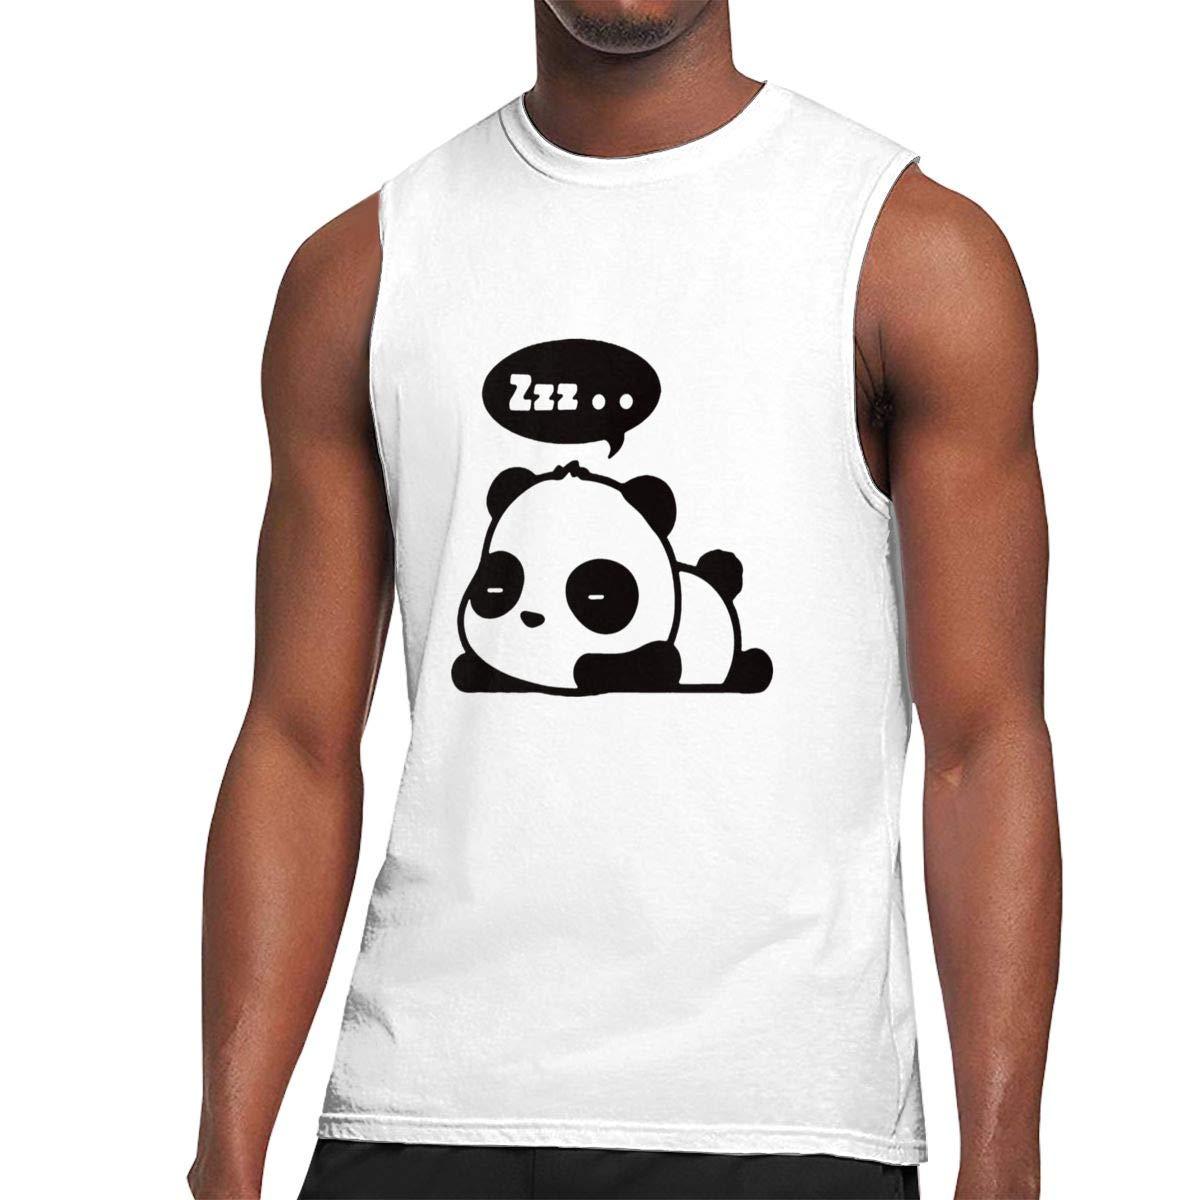 Seuriamin Sleeping Panda Cute Humor Outdoor Sleeveless Muscle Short Sleeve T Shirt